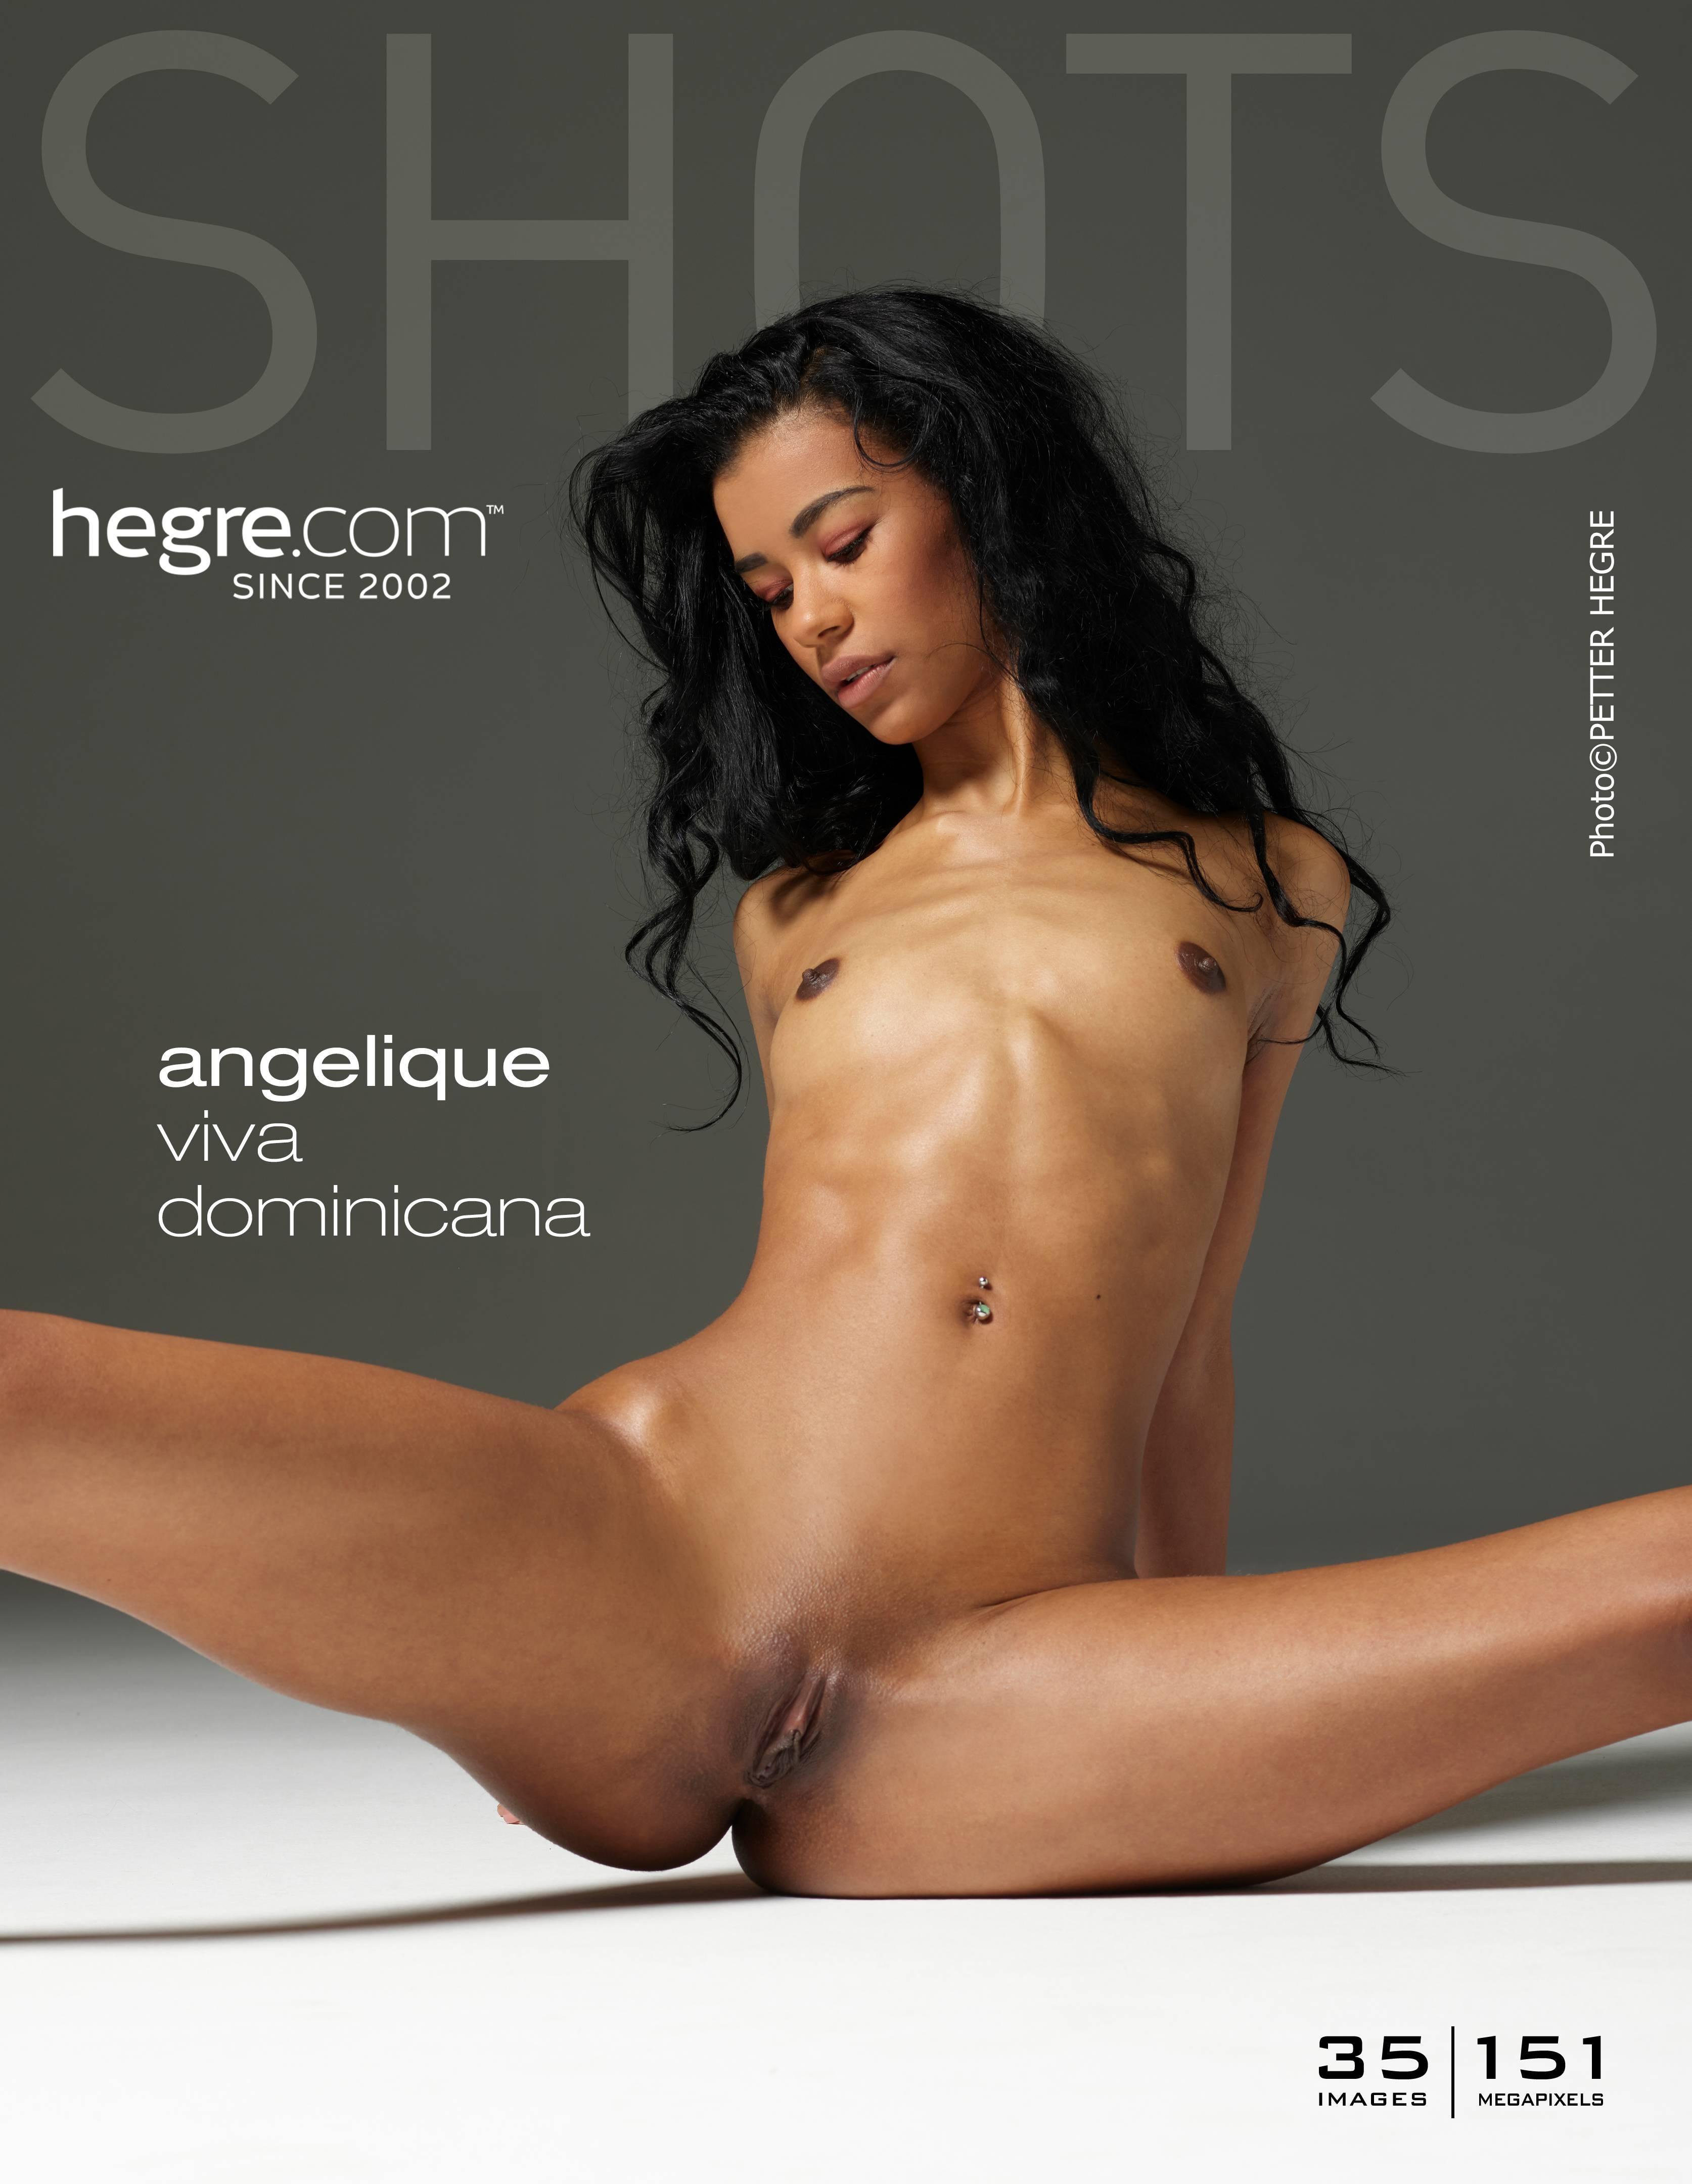 angelique viva dominicana poster